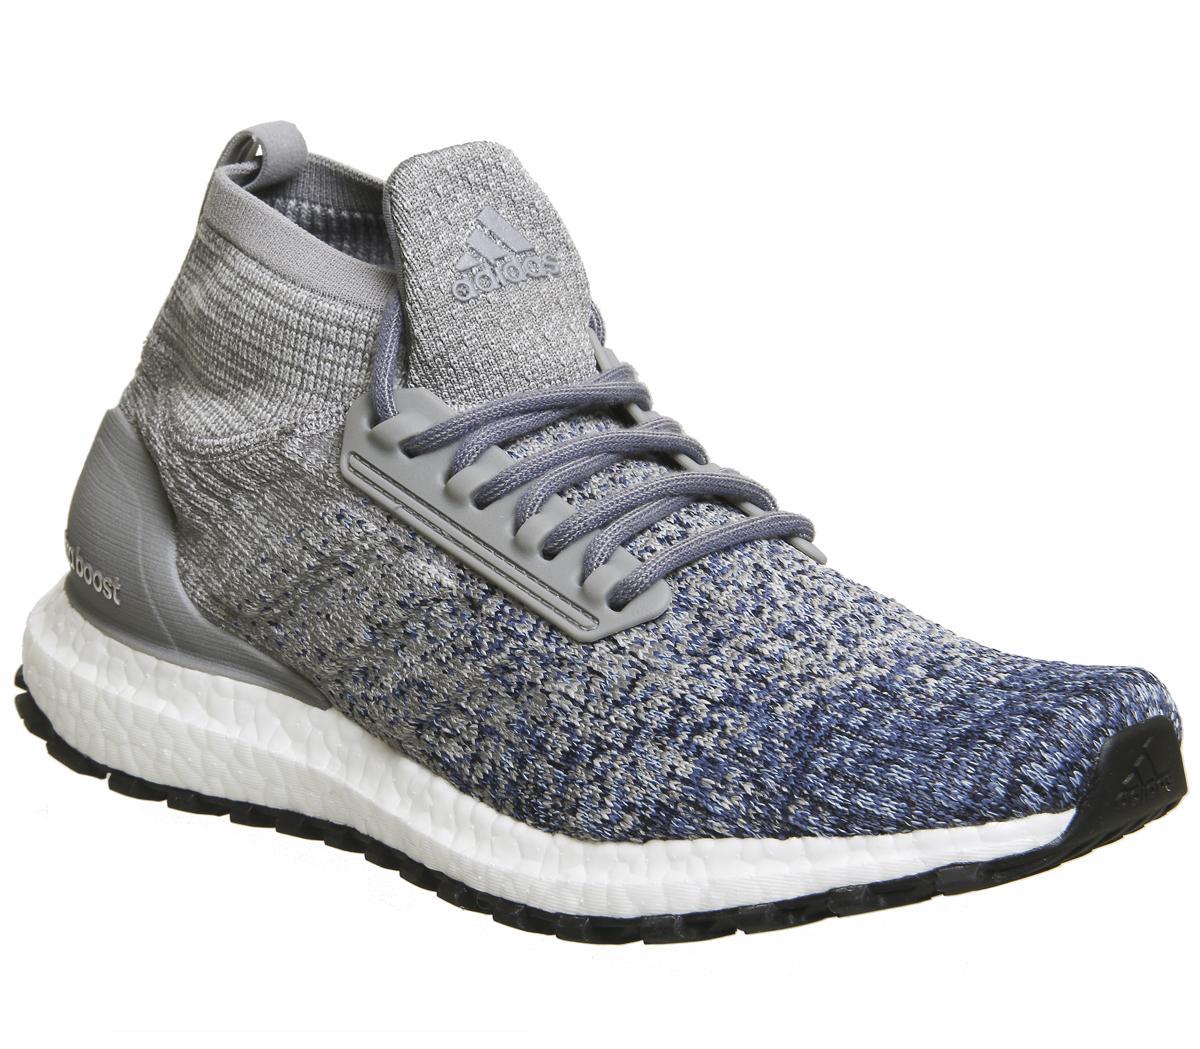 adidas Ultraboost Atr Grey Three His trainers